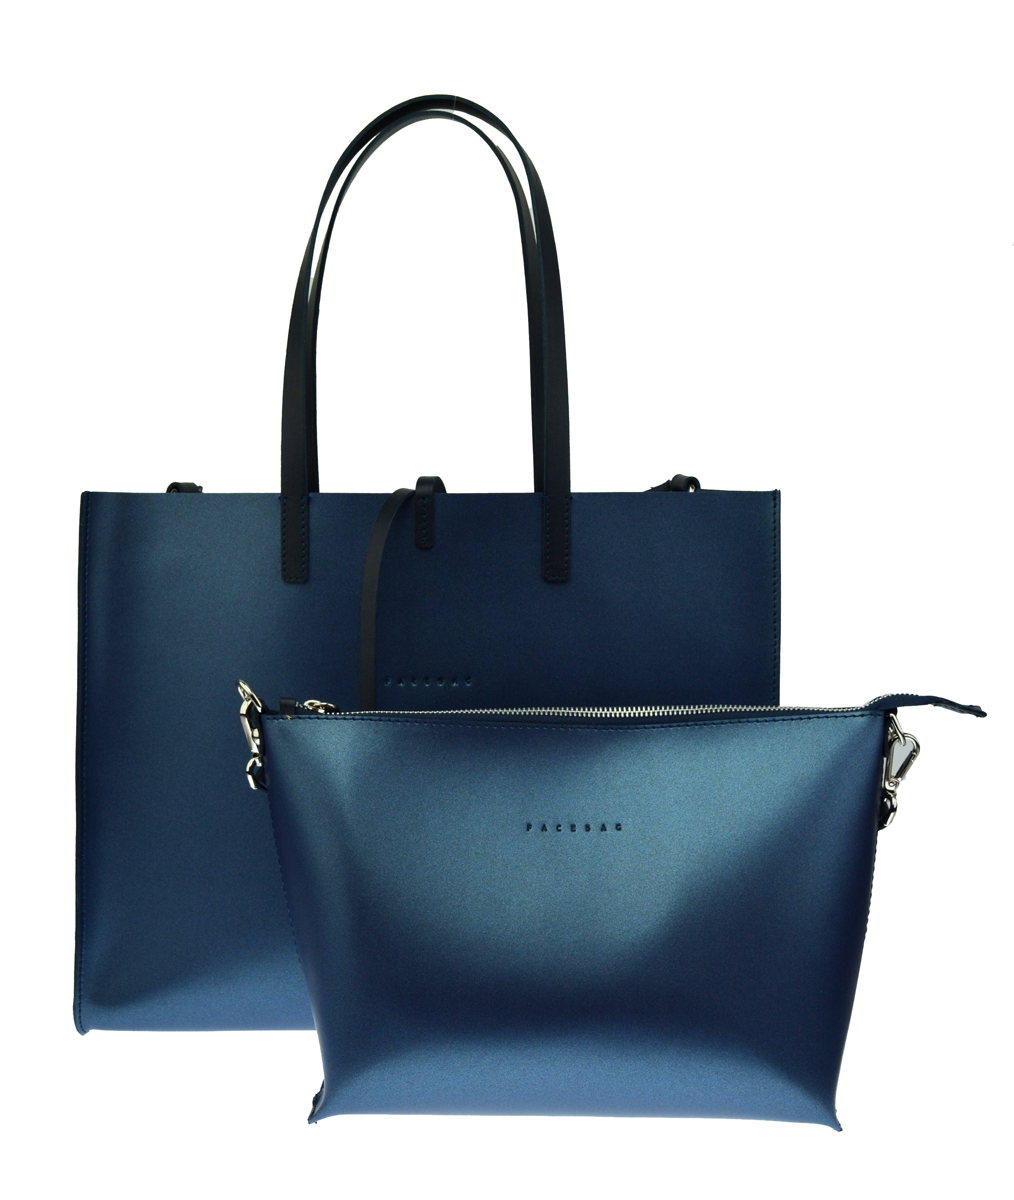 Dámská kožená kabelka FACEBAG 2v1 CHERI 1 - Metalická modrá